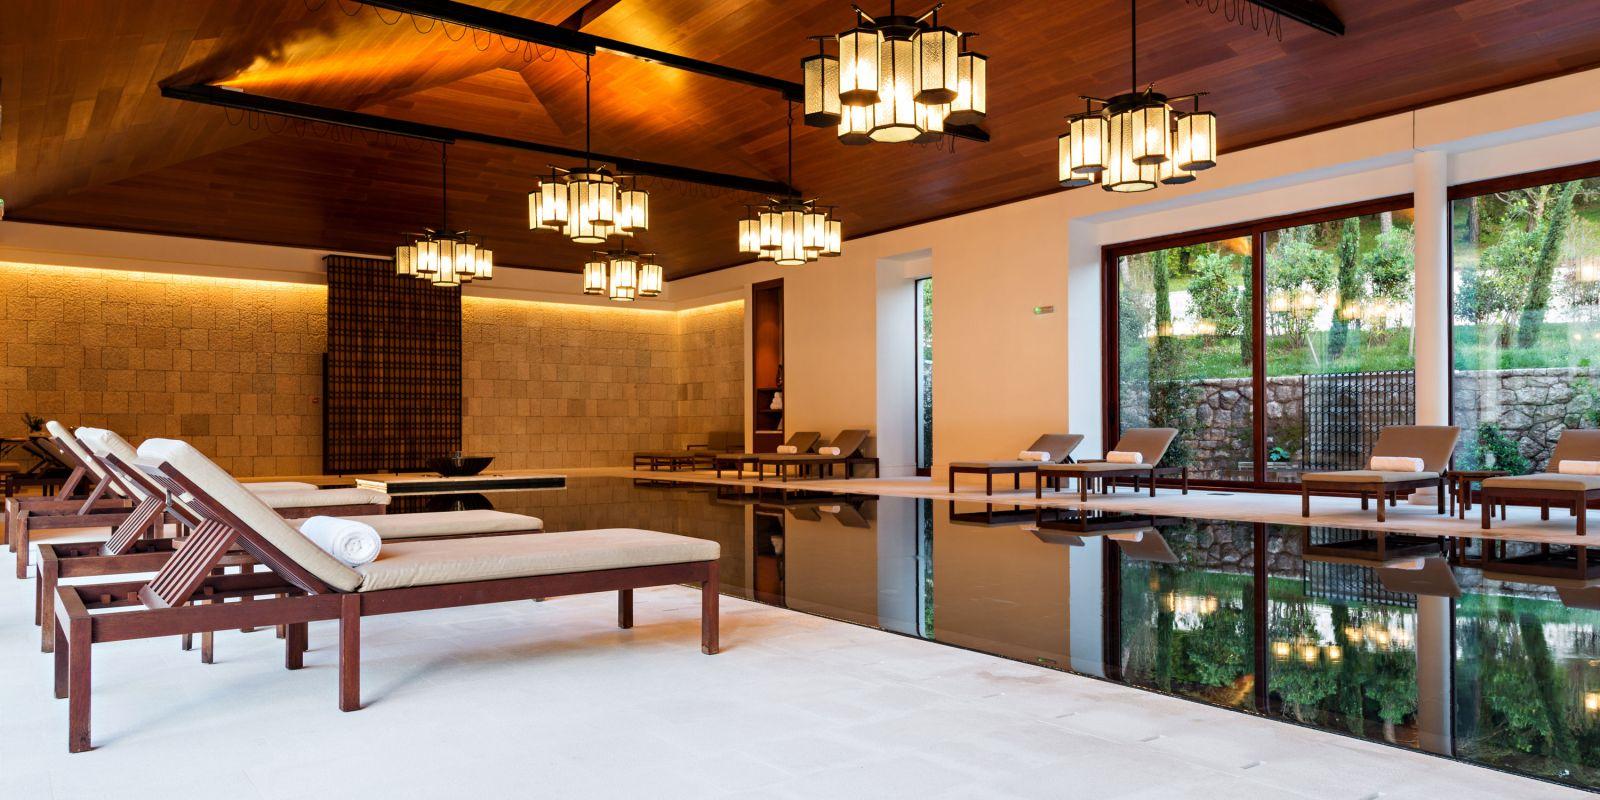 Poolheizung, Poolsanierung, Swimmingpool, Pool bauen | AC ...